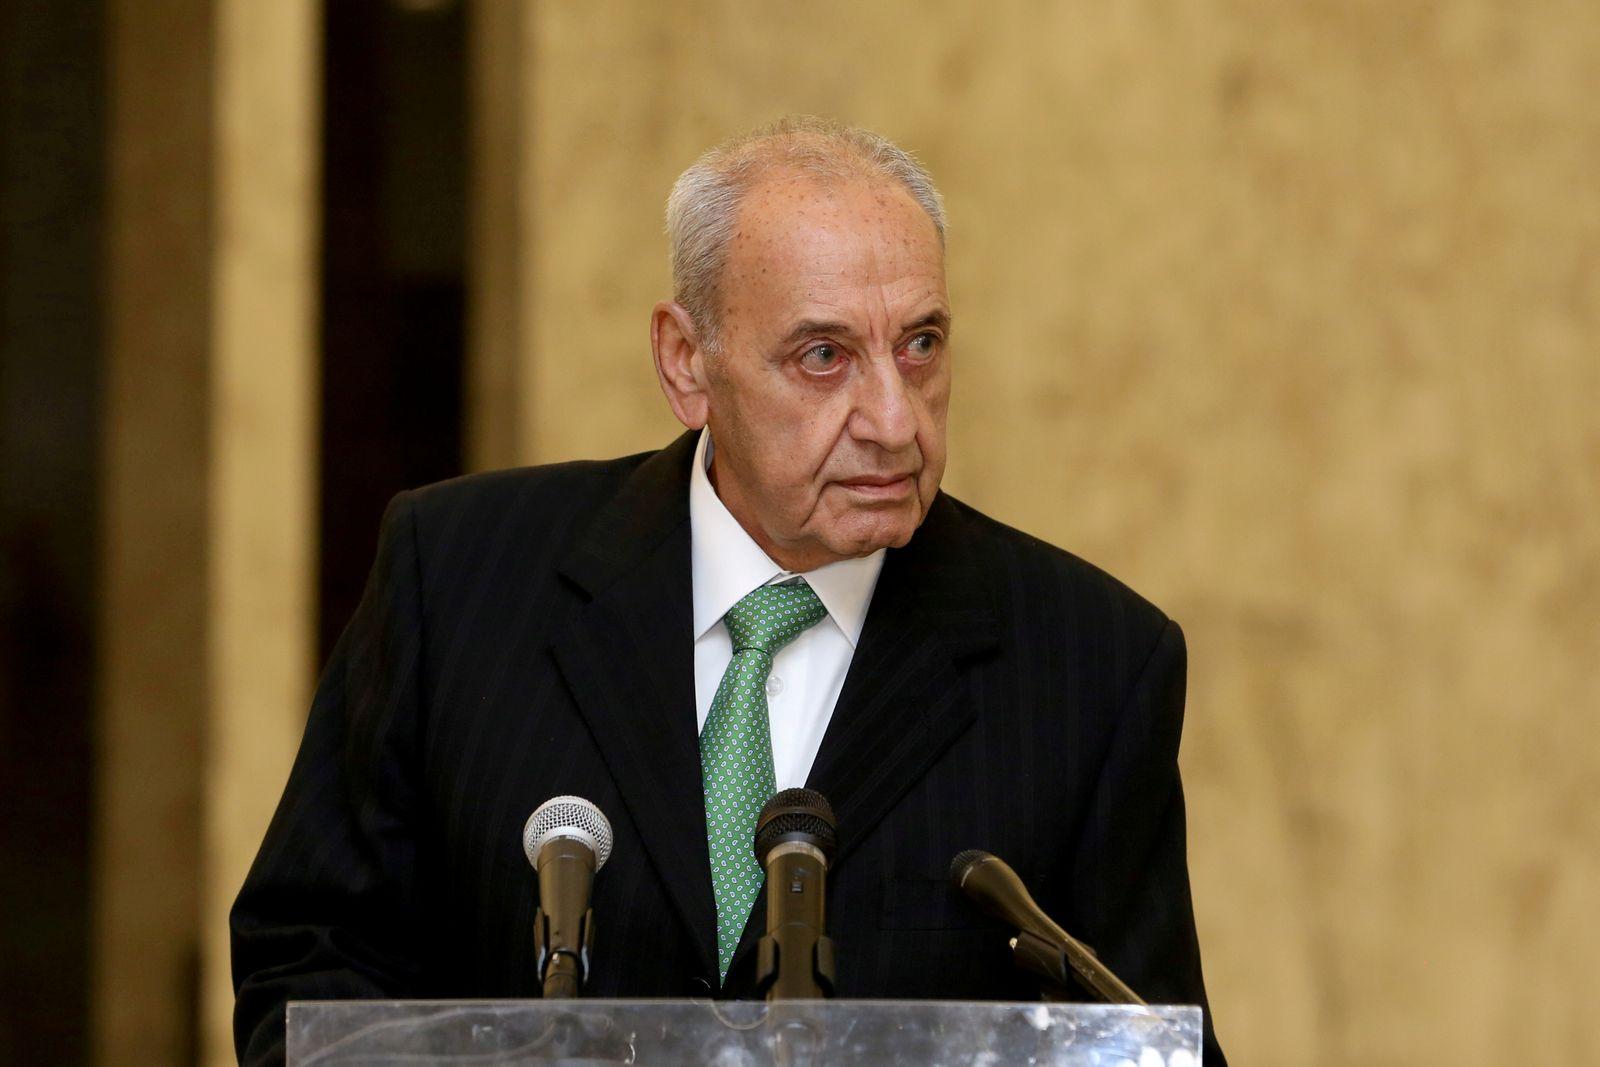 FILE PHOTO: Lebanese Parliament Speaker Nabih Berri is seen at the presidential palace in Baabda